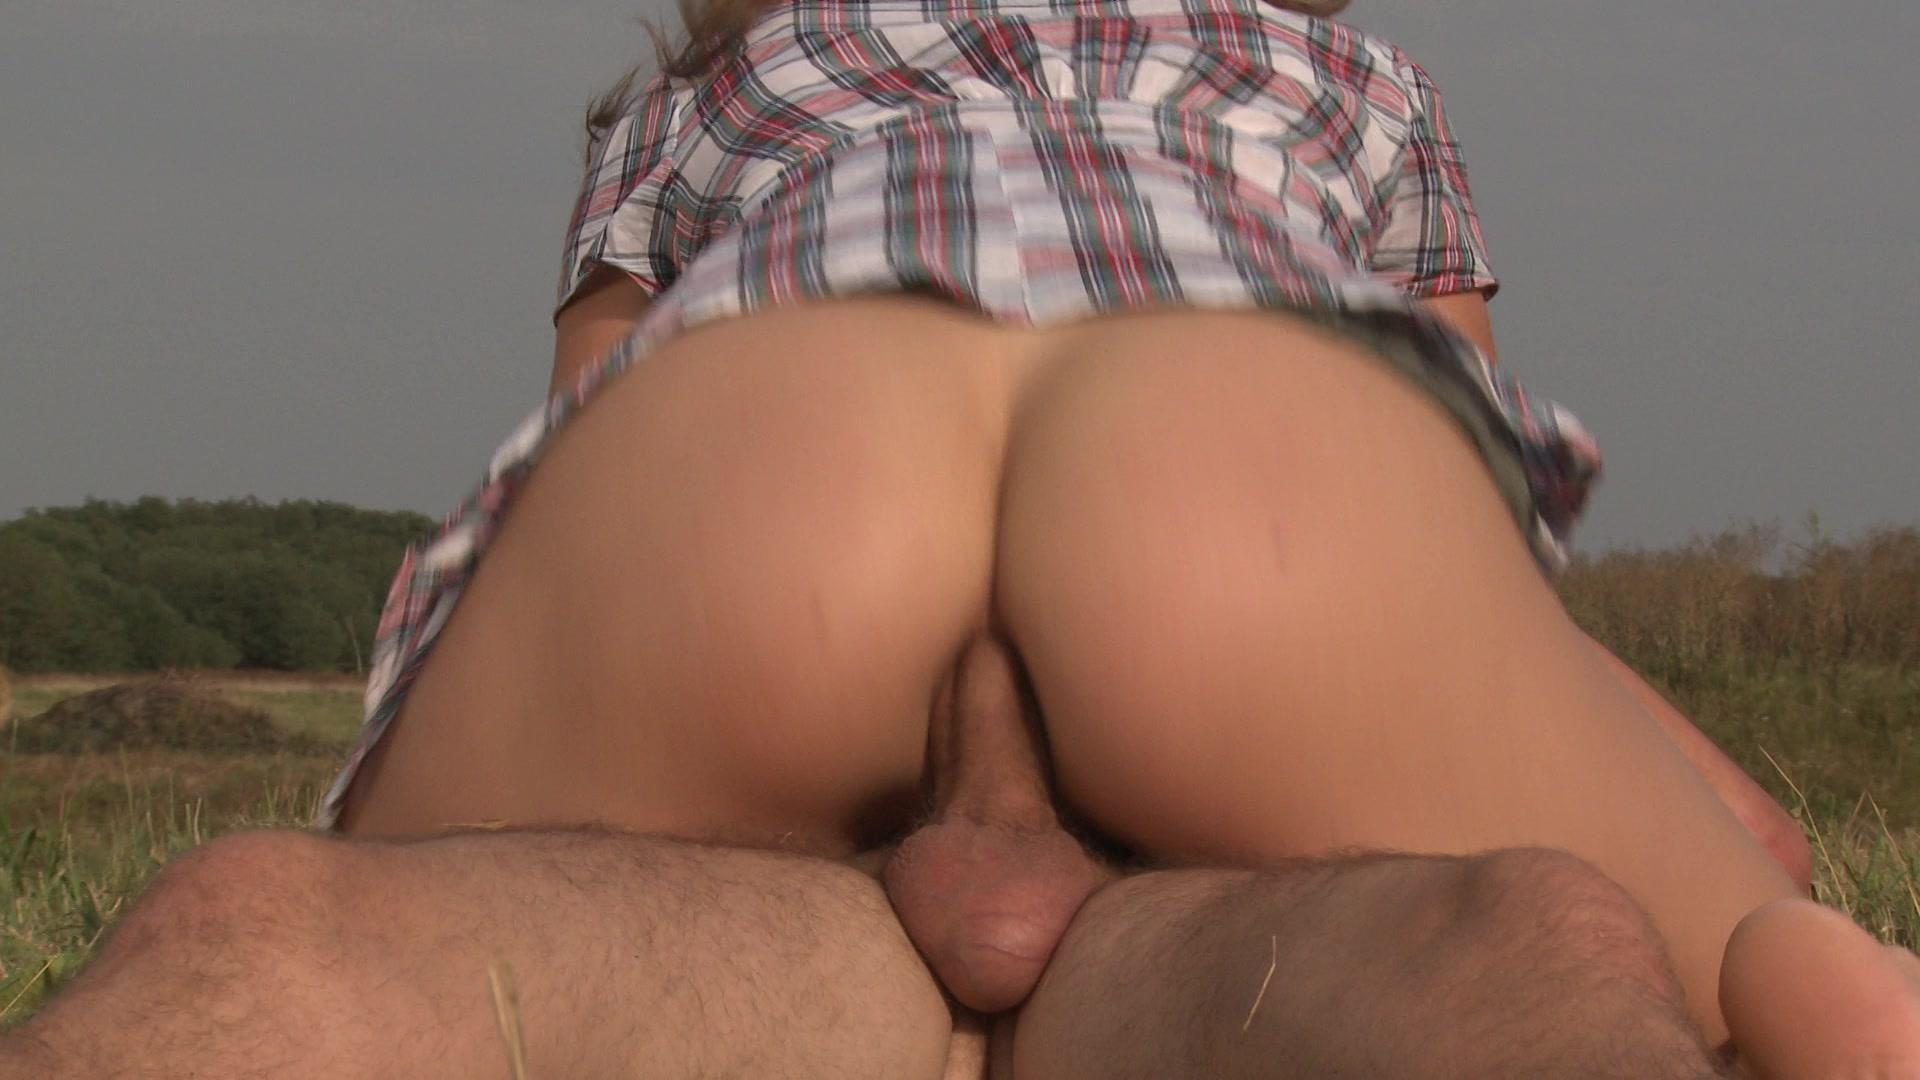 Farm girl sex tumblr